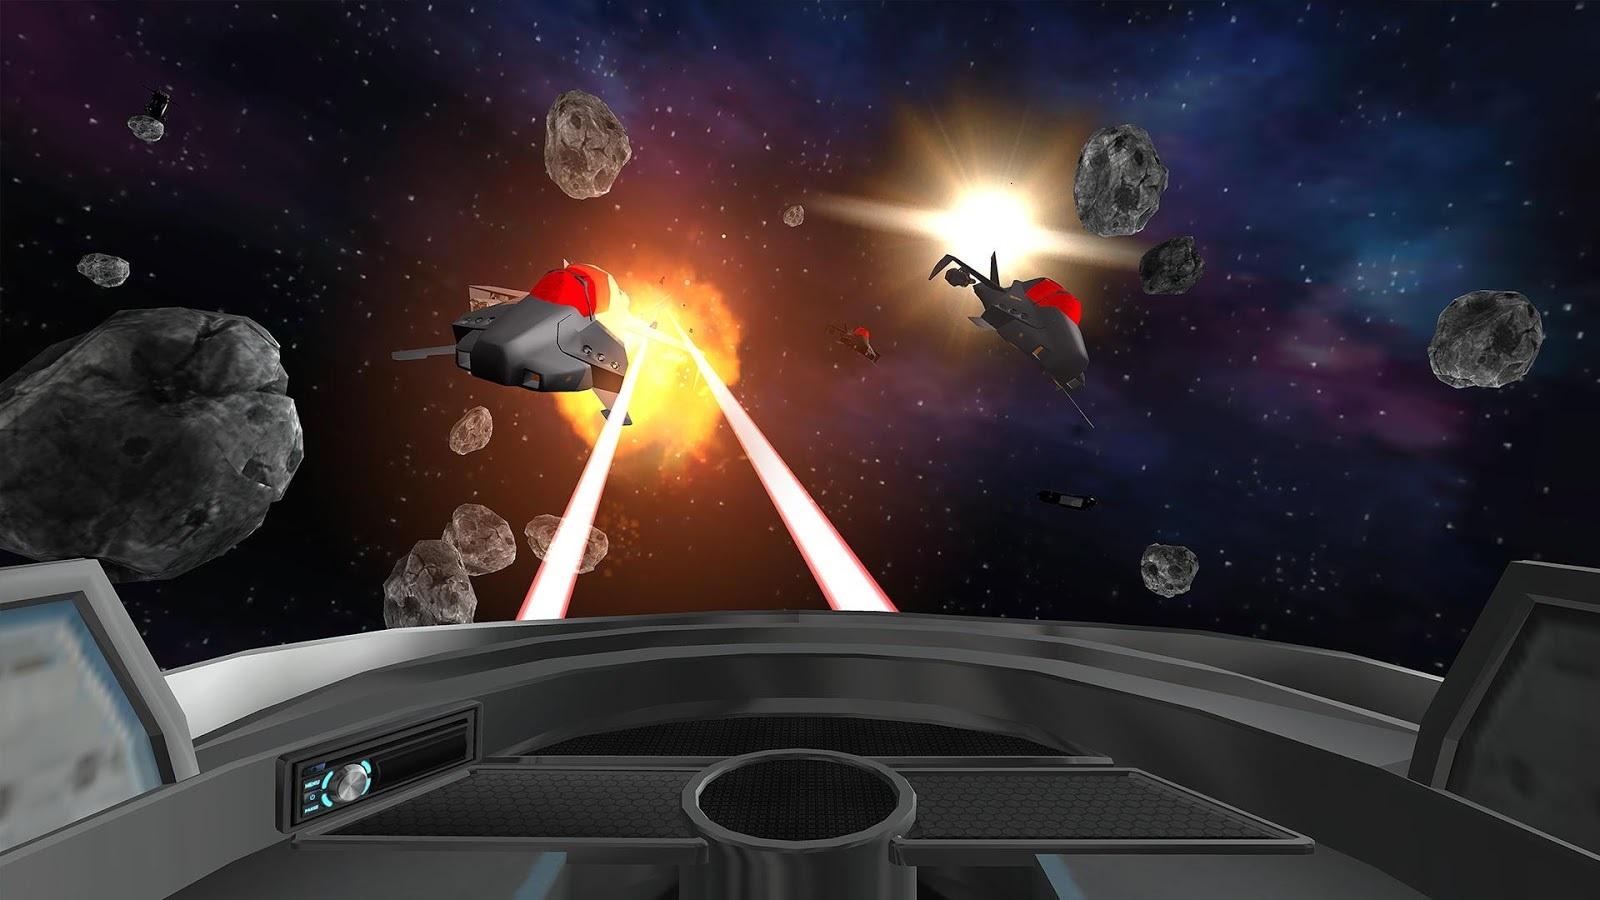 spacecraft computer game - photo #49